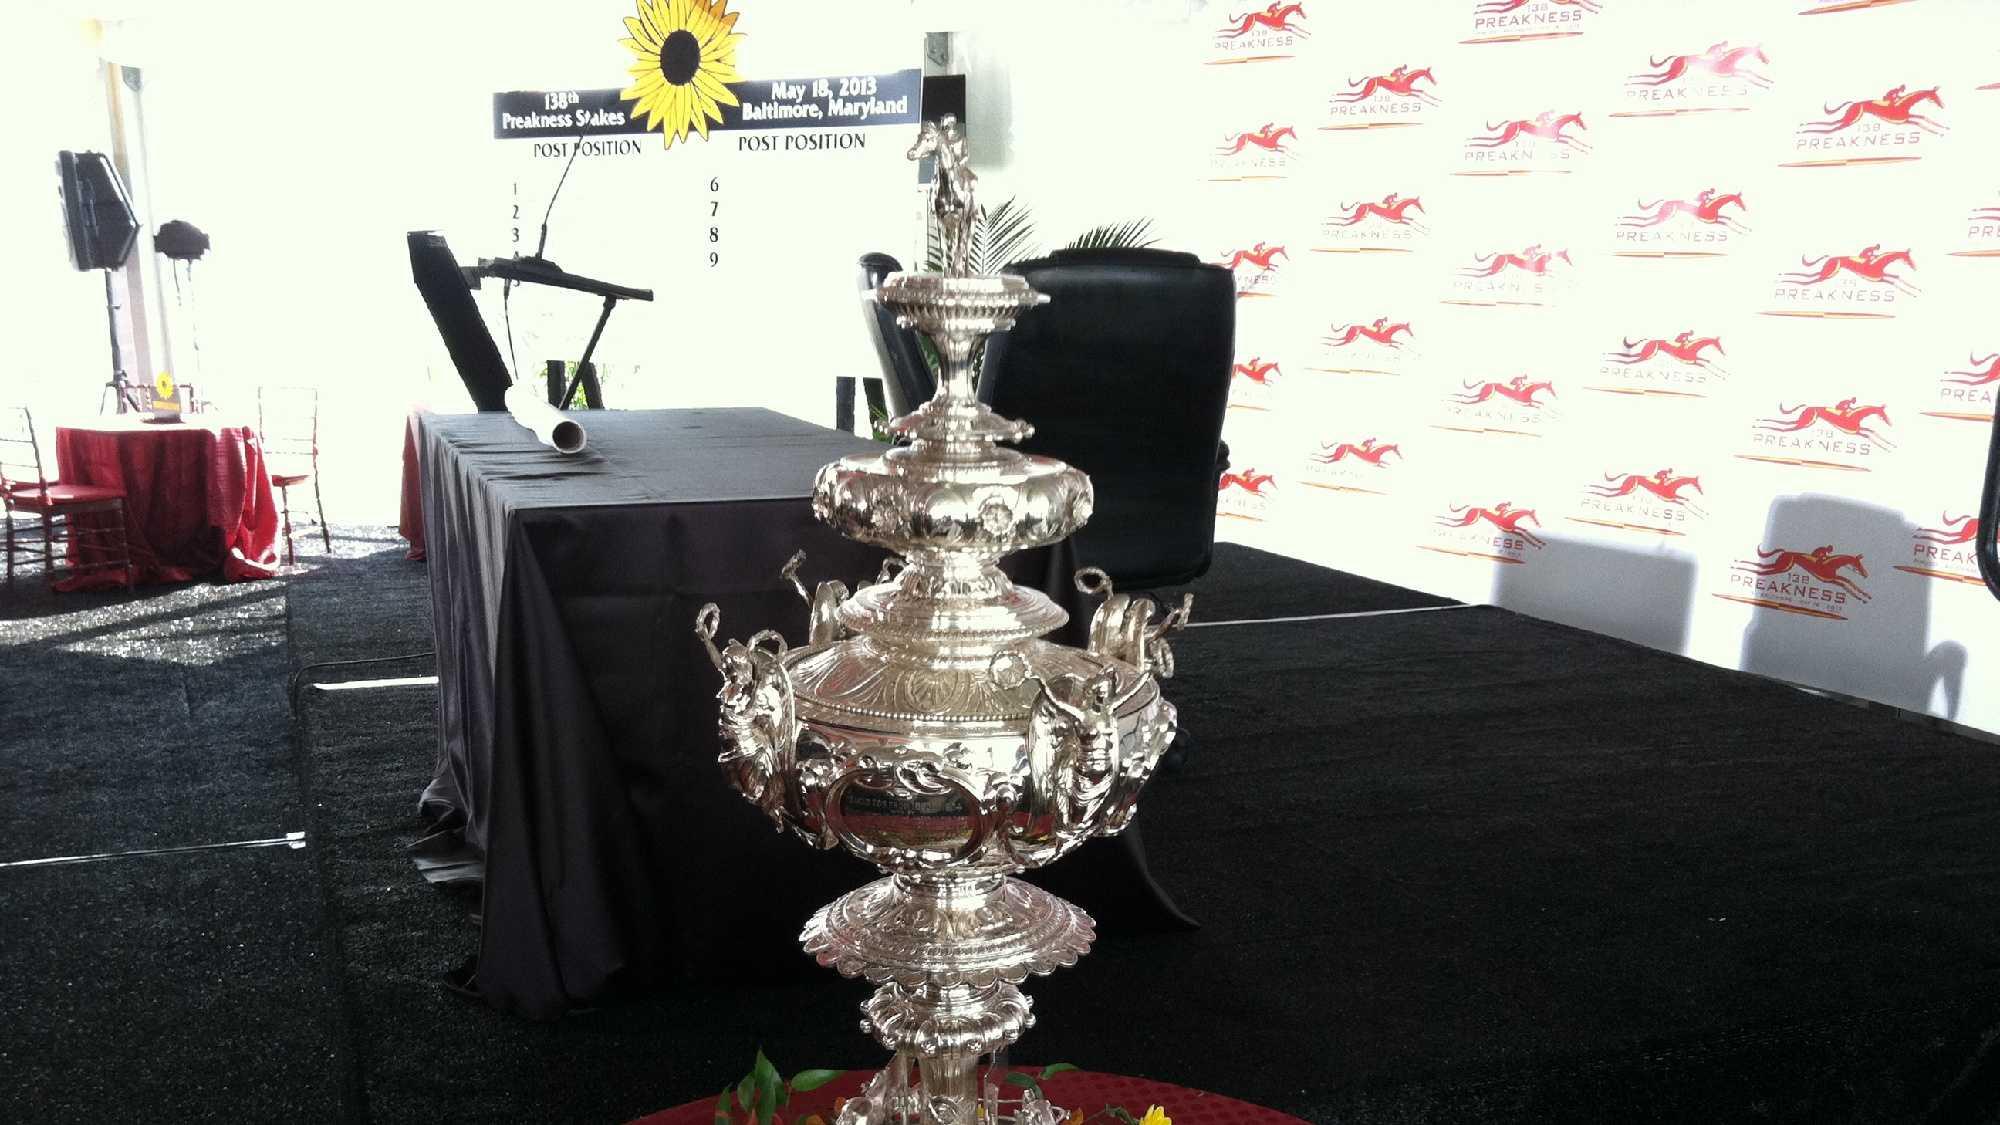 The Woodlawn Vase